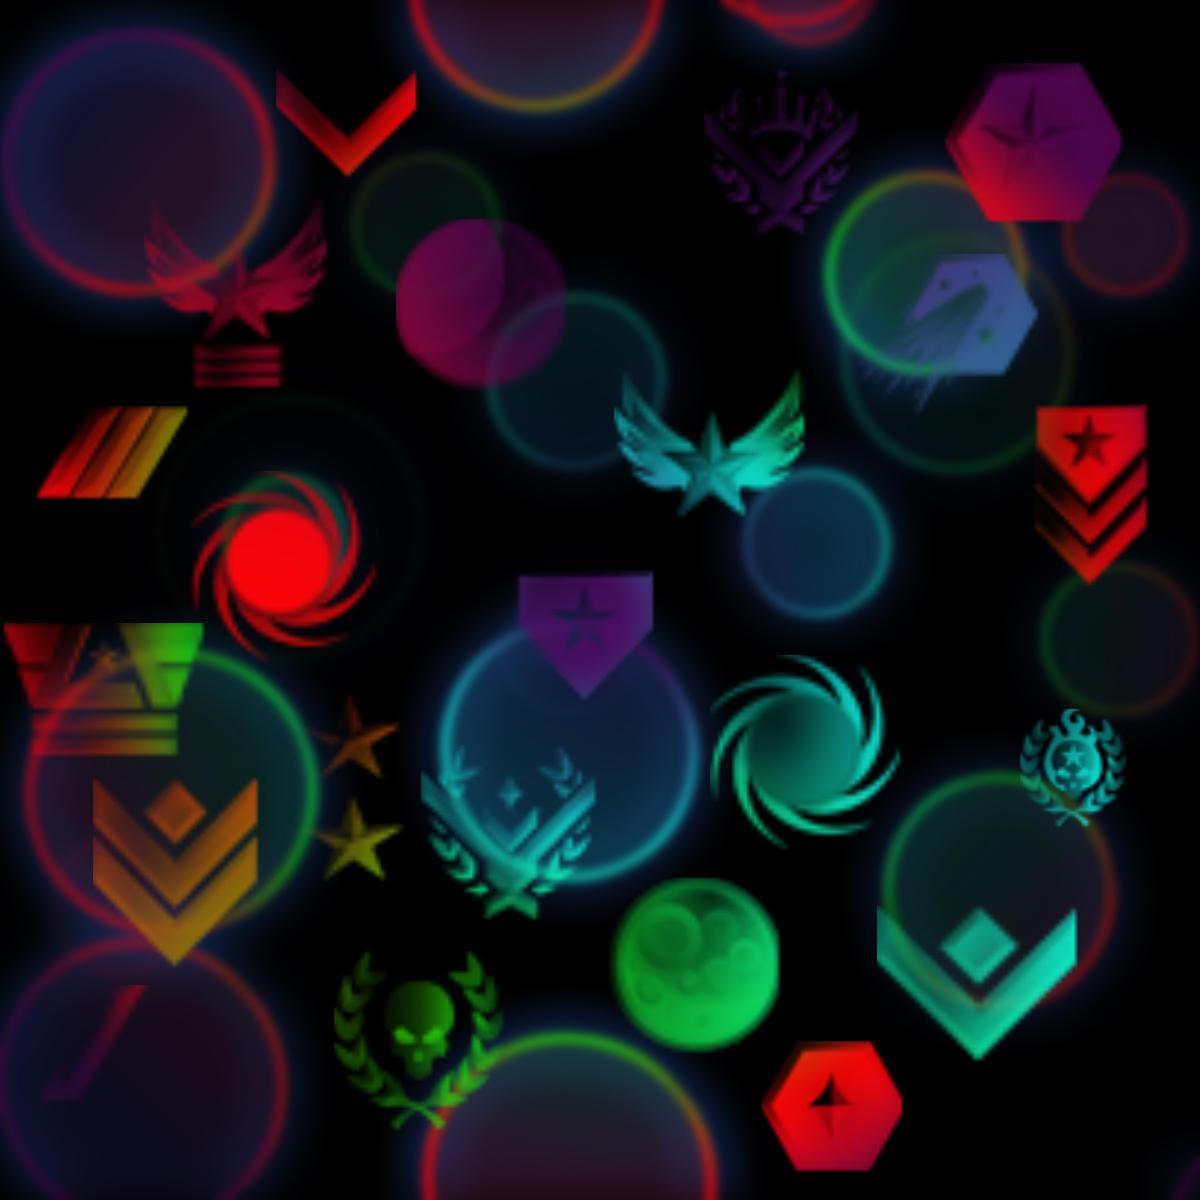 Halo Live Wallpaper: Halo Reach Rank Brushs By Chrisfanner On DeviantArt